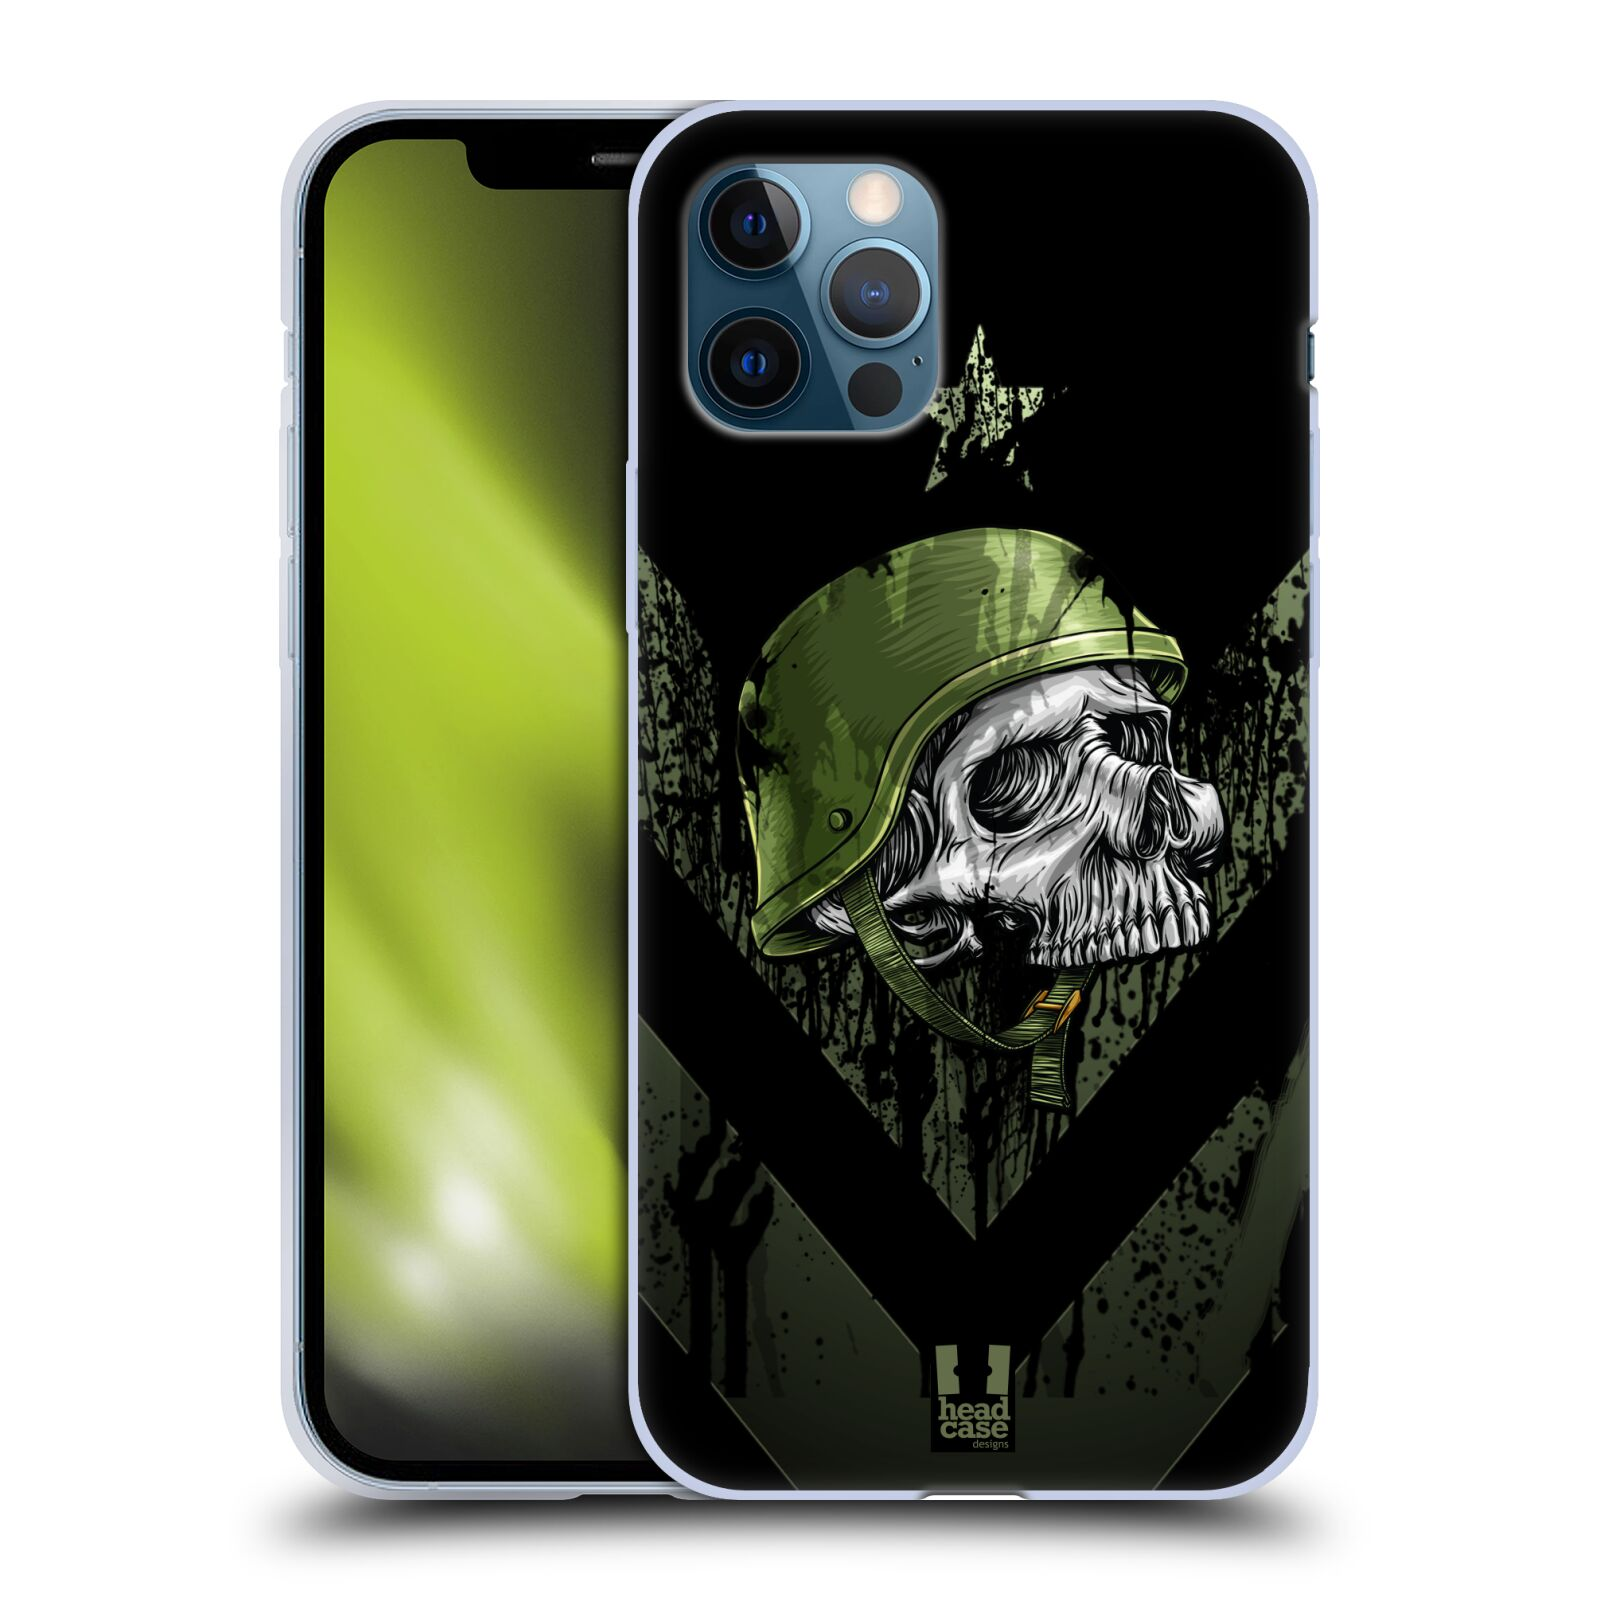 Silikonové pouzdro na mobil Apple iPhone 12 / 12 Pro - Head Case - LEBKA ONE MAN